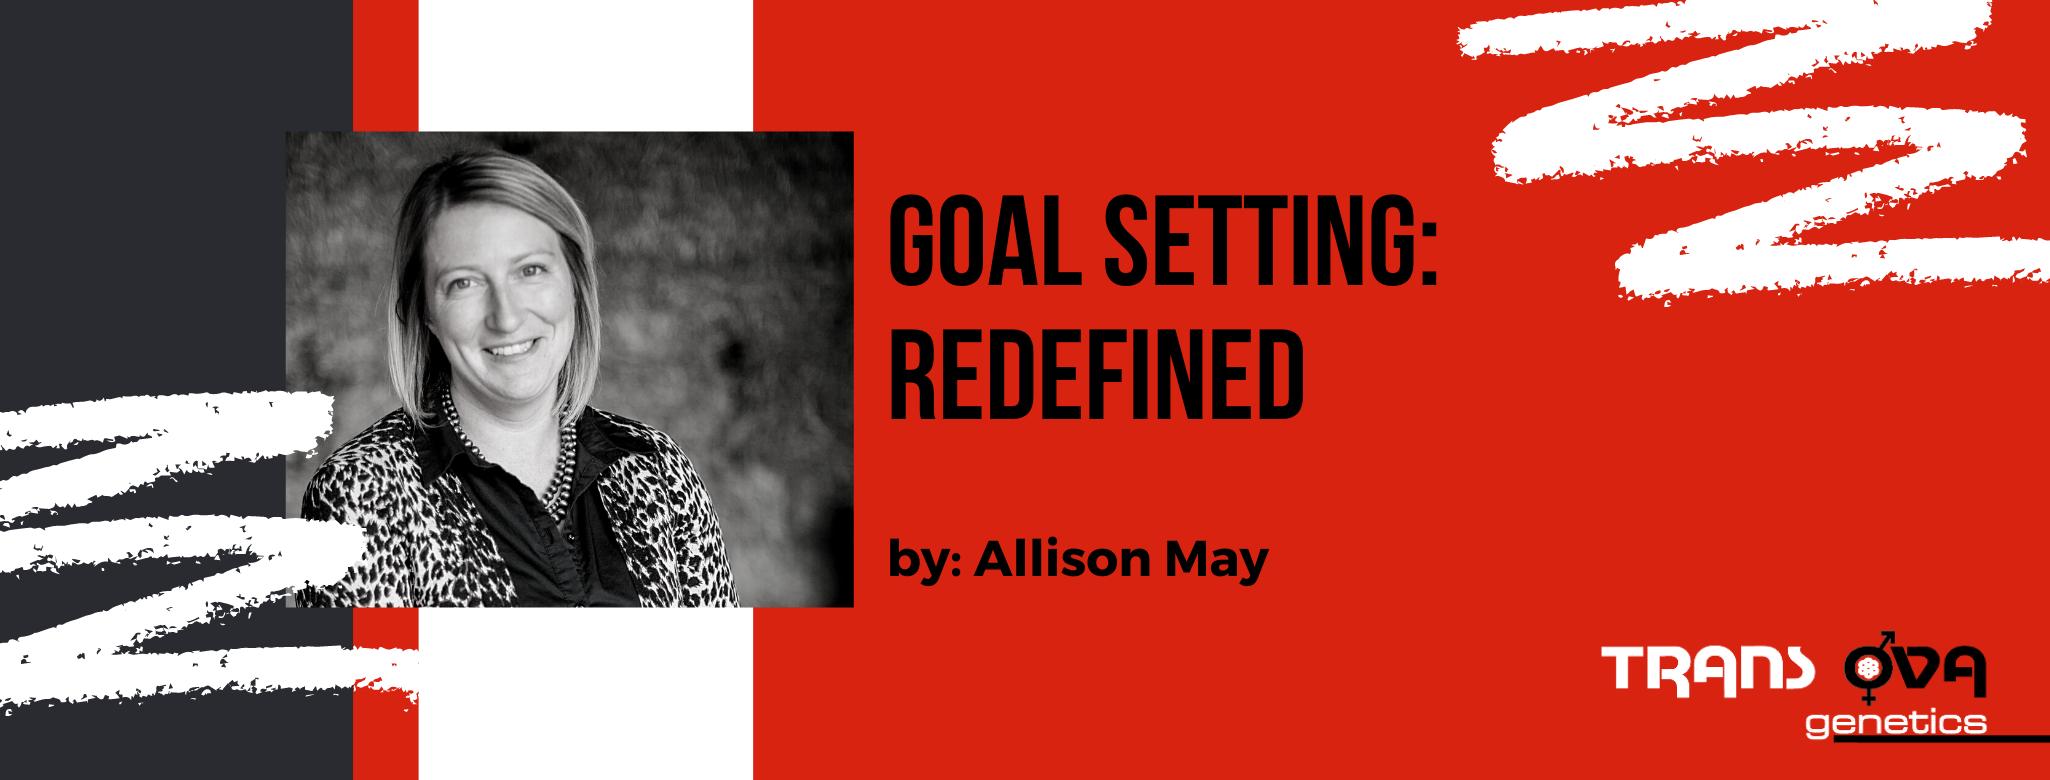 Goal Setting: Redefined